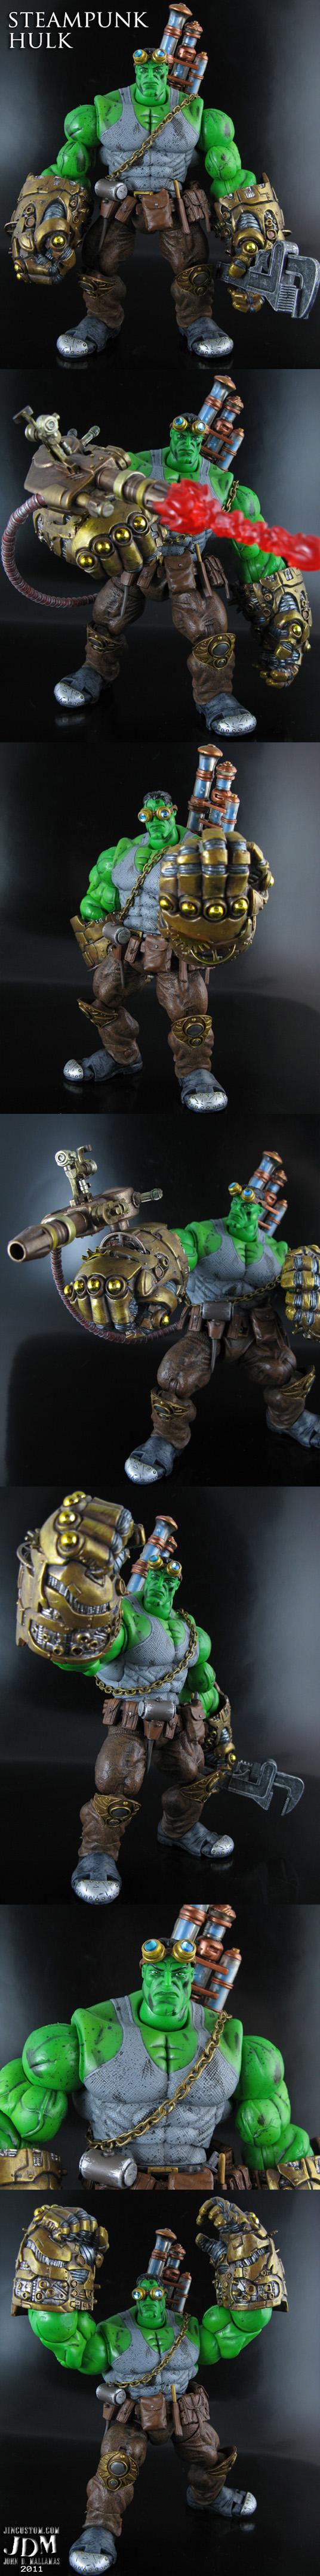 Steampunk Hulk